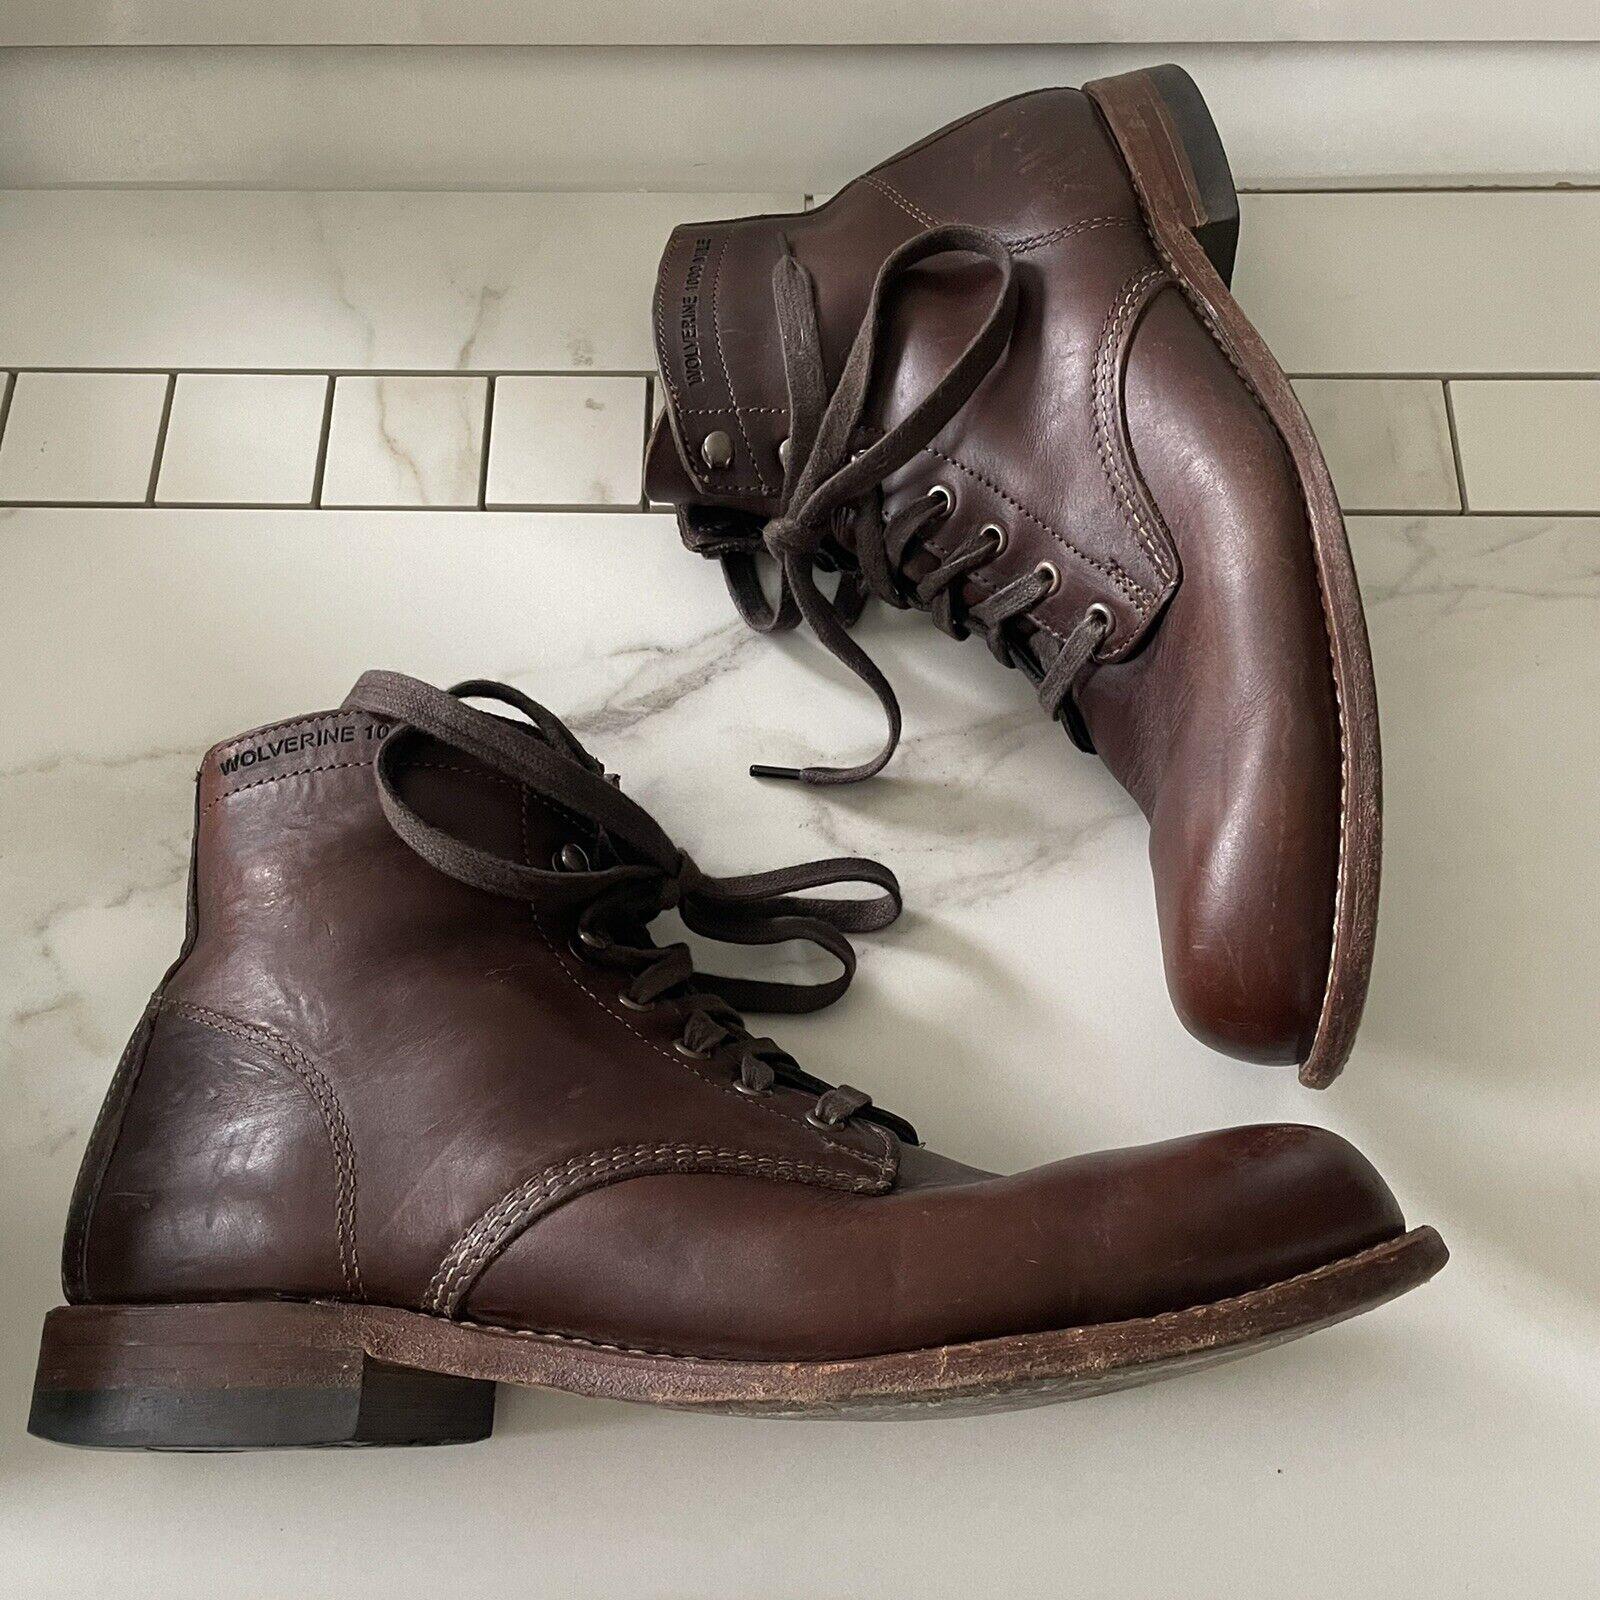 Wolverine 1000 Mile Ankle Boots Brown Leather Lace Up Plain Toe Men Size US 9.5